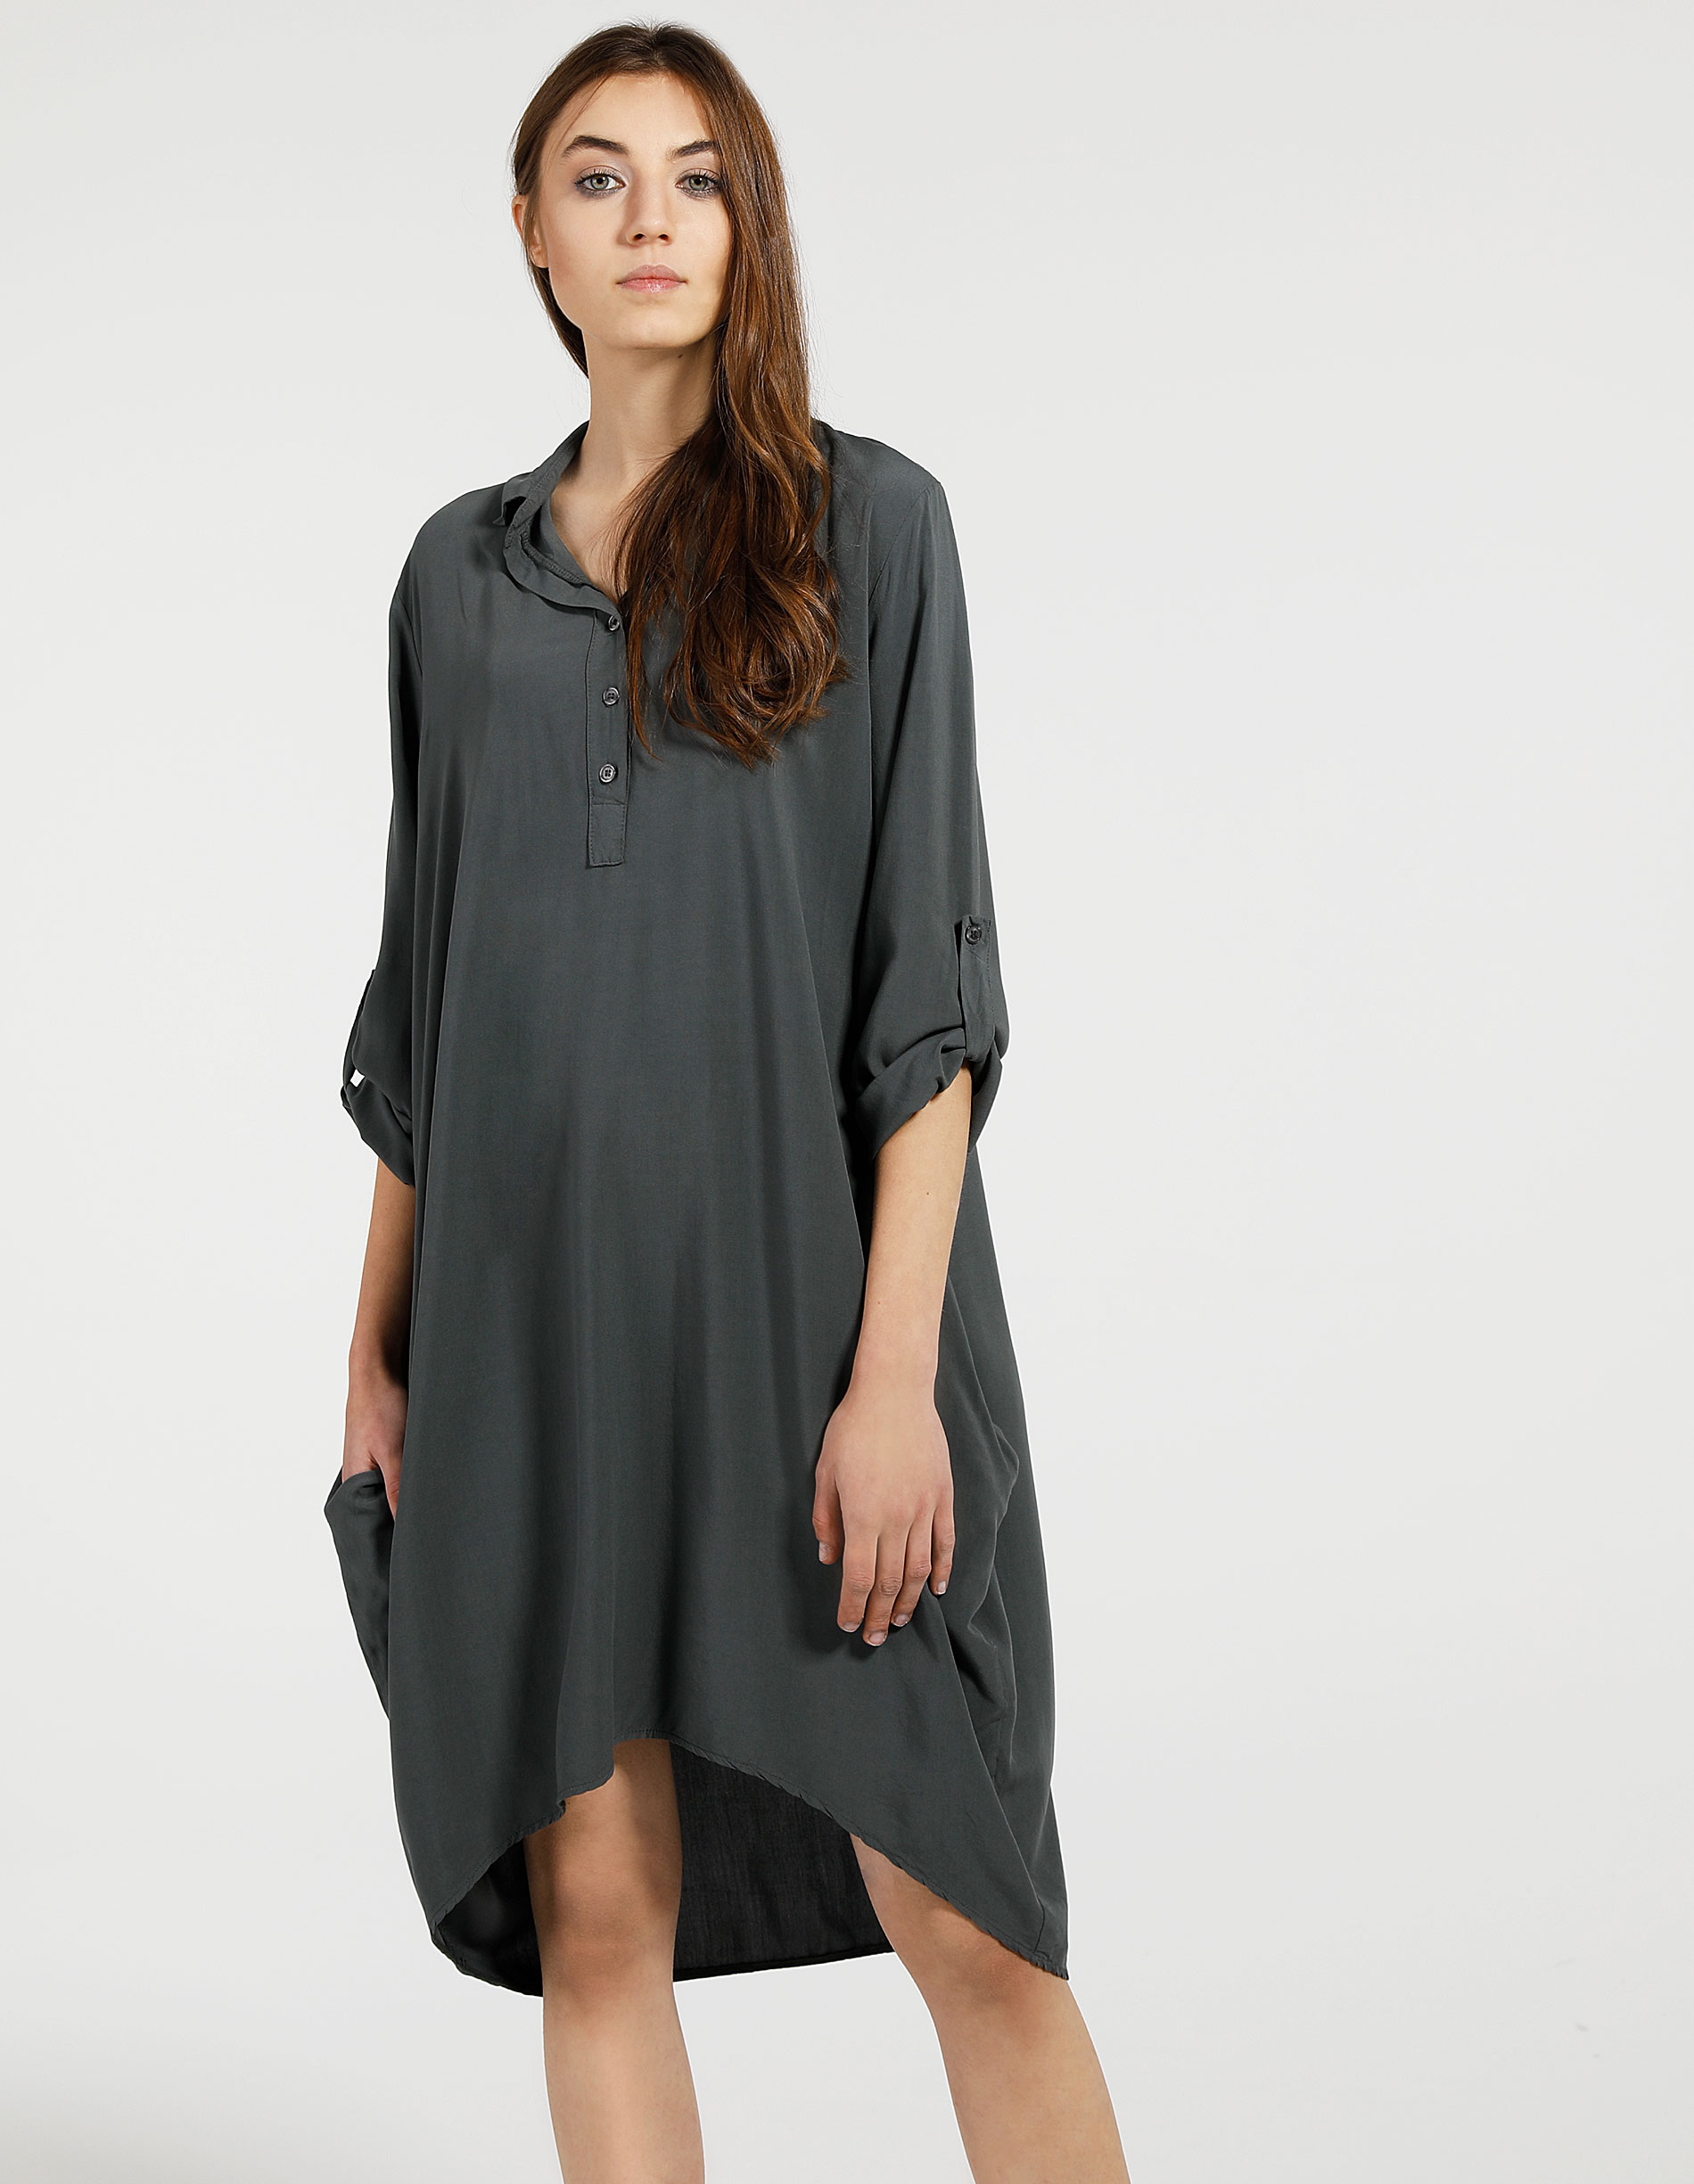 Sukienka - 45-656 PIOMBO - Unisono